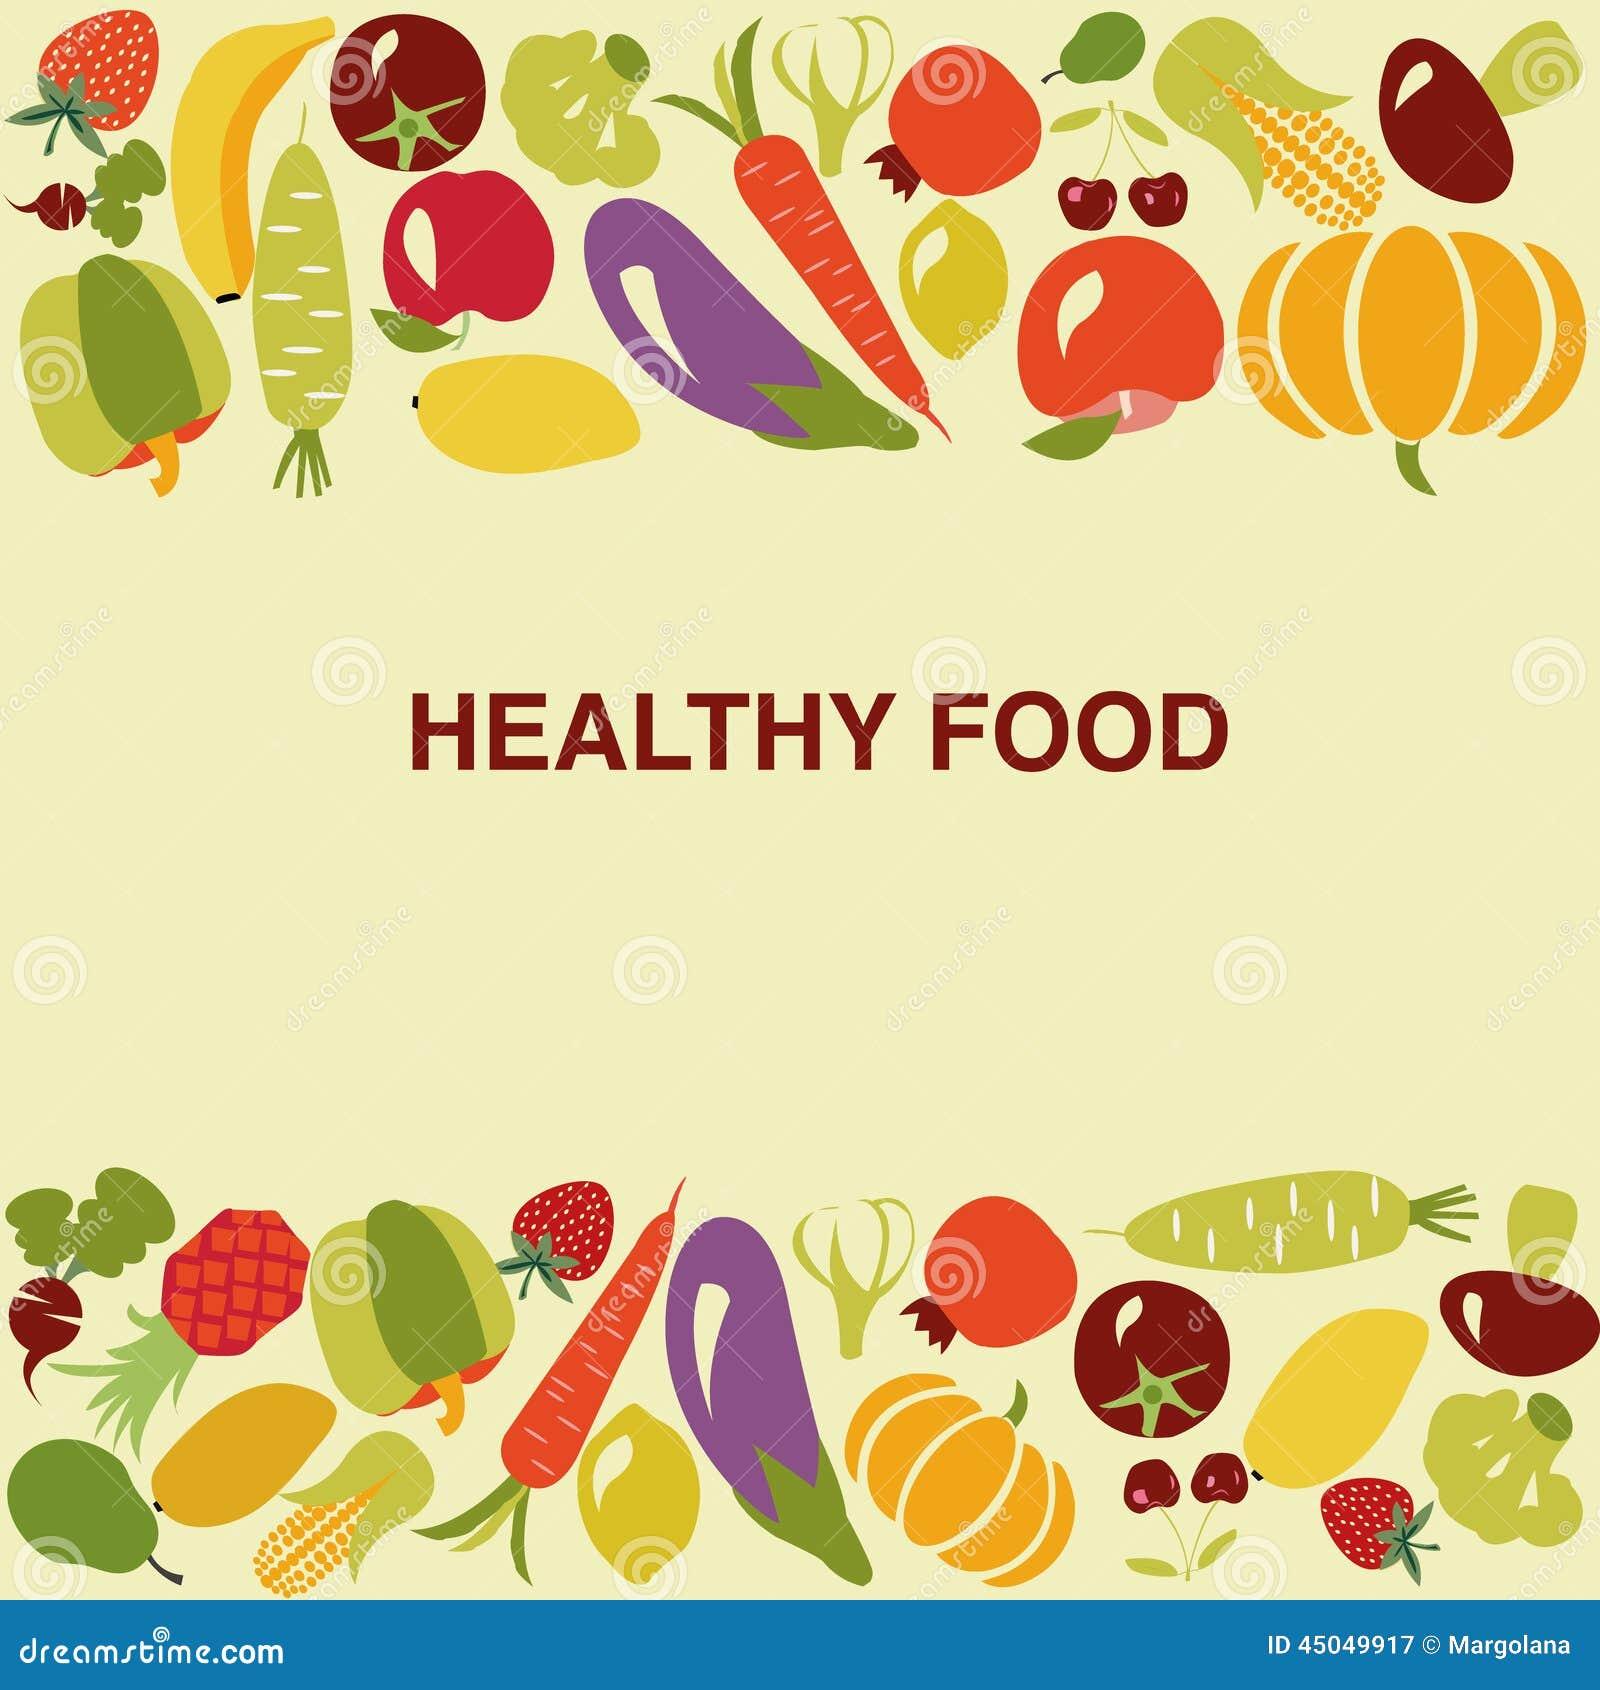 Healthy Food Background Illustration Stock Vector Illustration Of Eggplant Nature 45049917